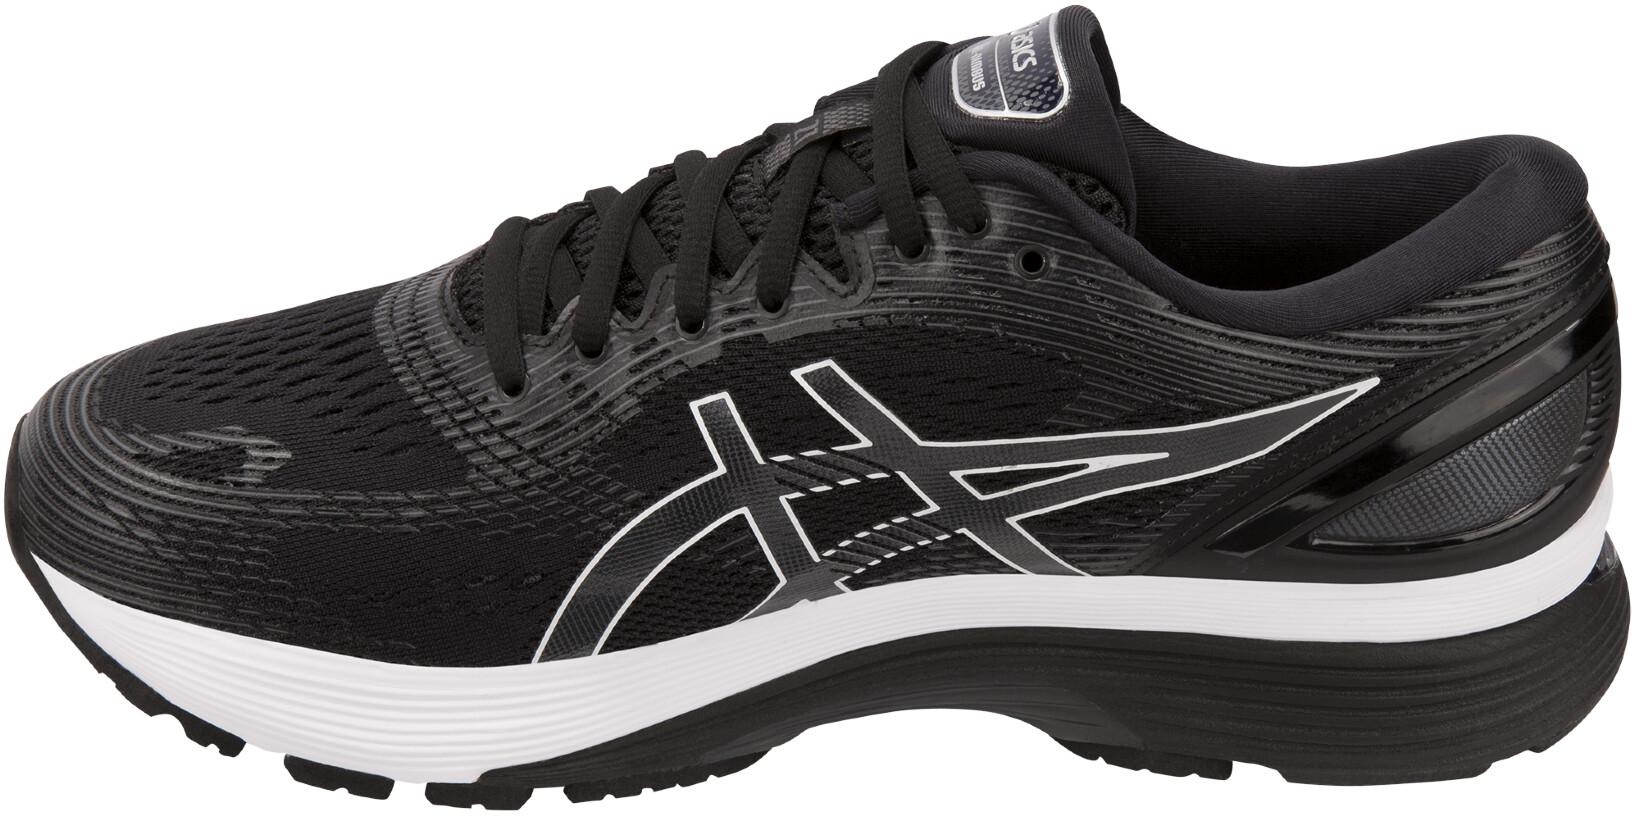 d65da20bb946 asics Gel-Nimbus 21 Chaussures Homme, black/dark grey - Boutique de ...